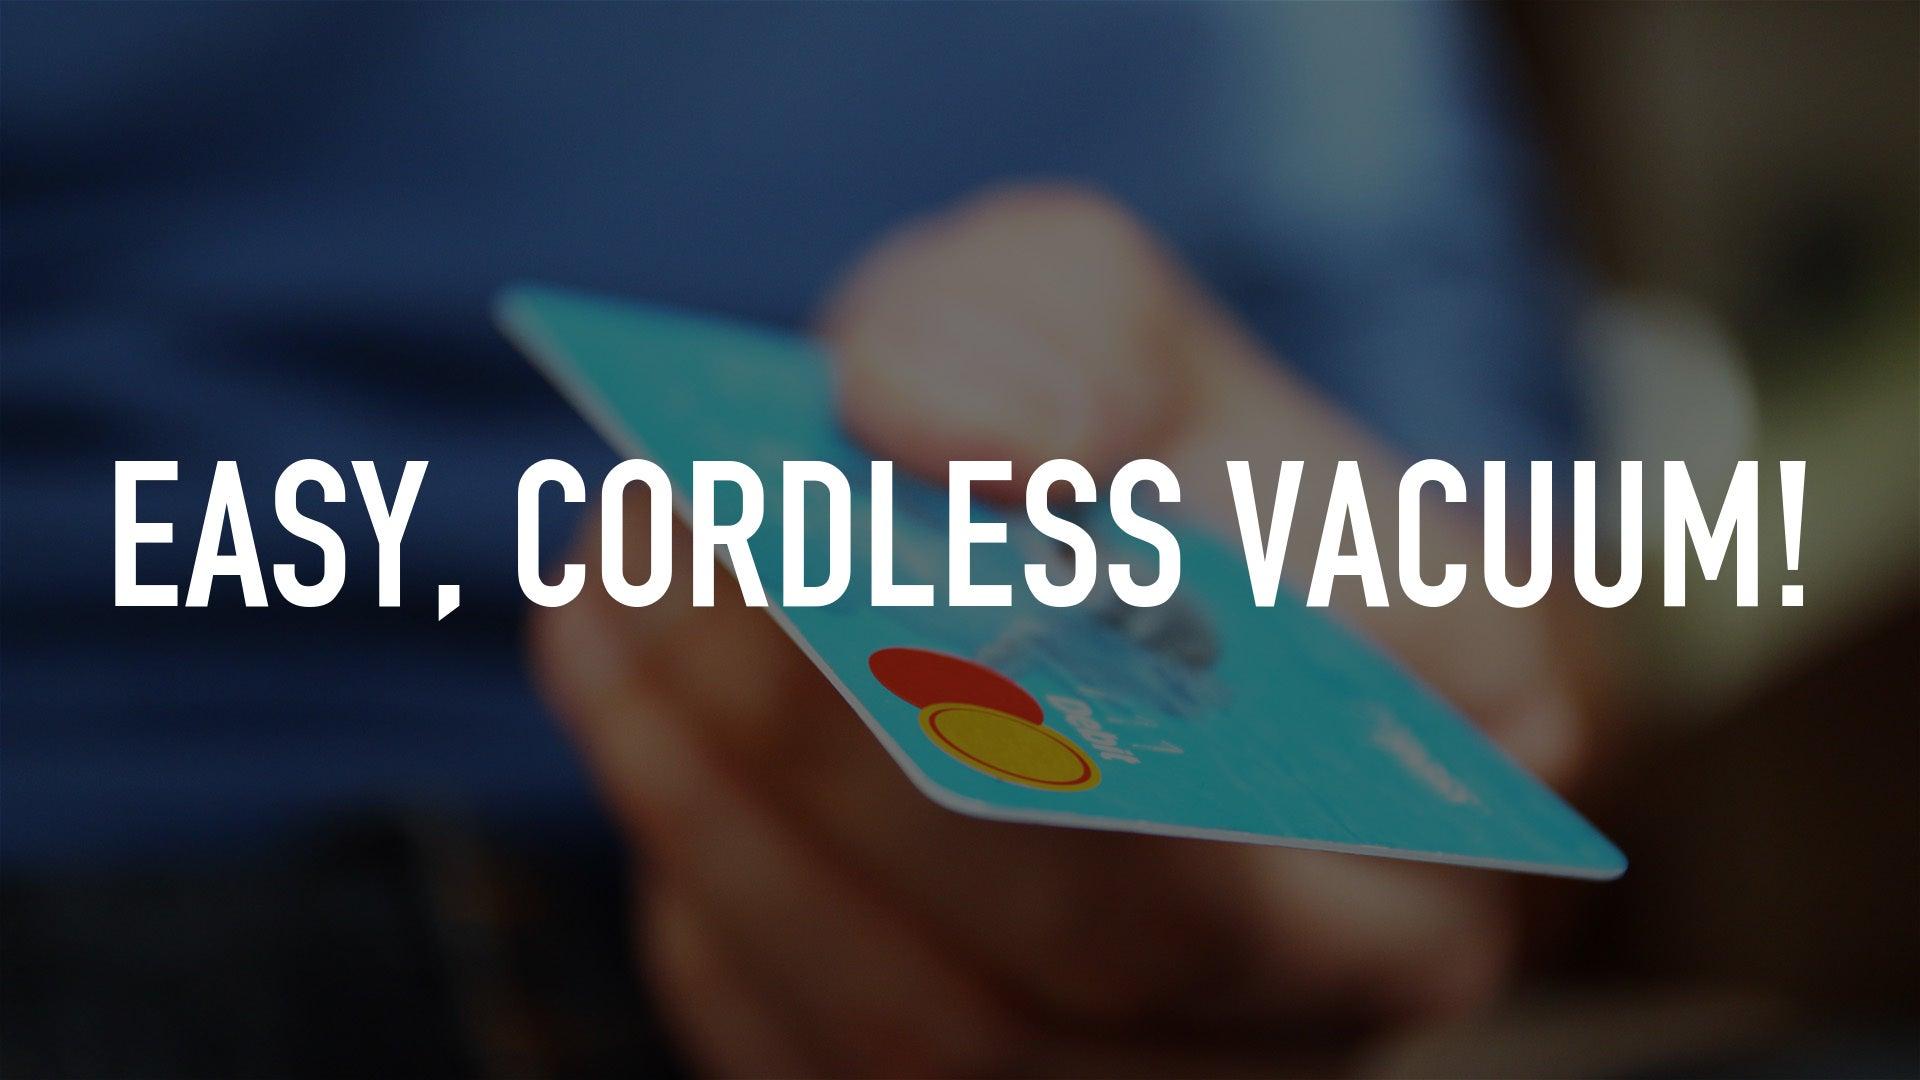 Easy, Cordless Vacuum!